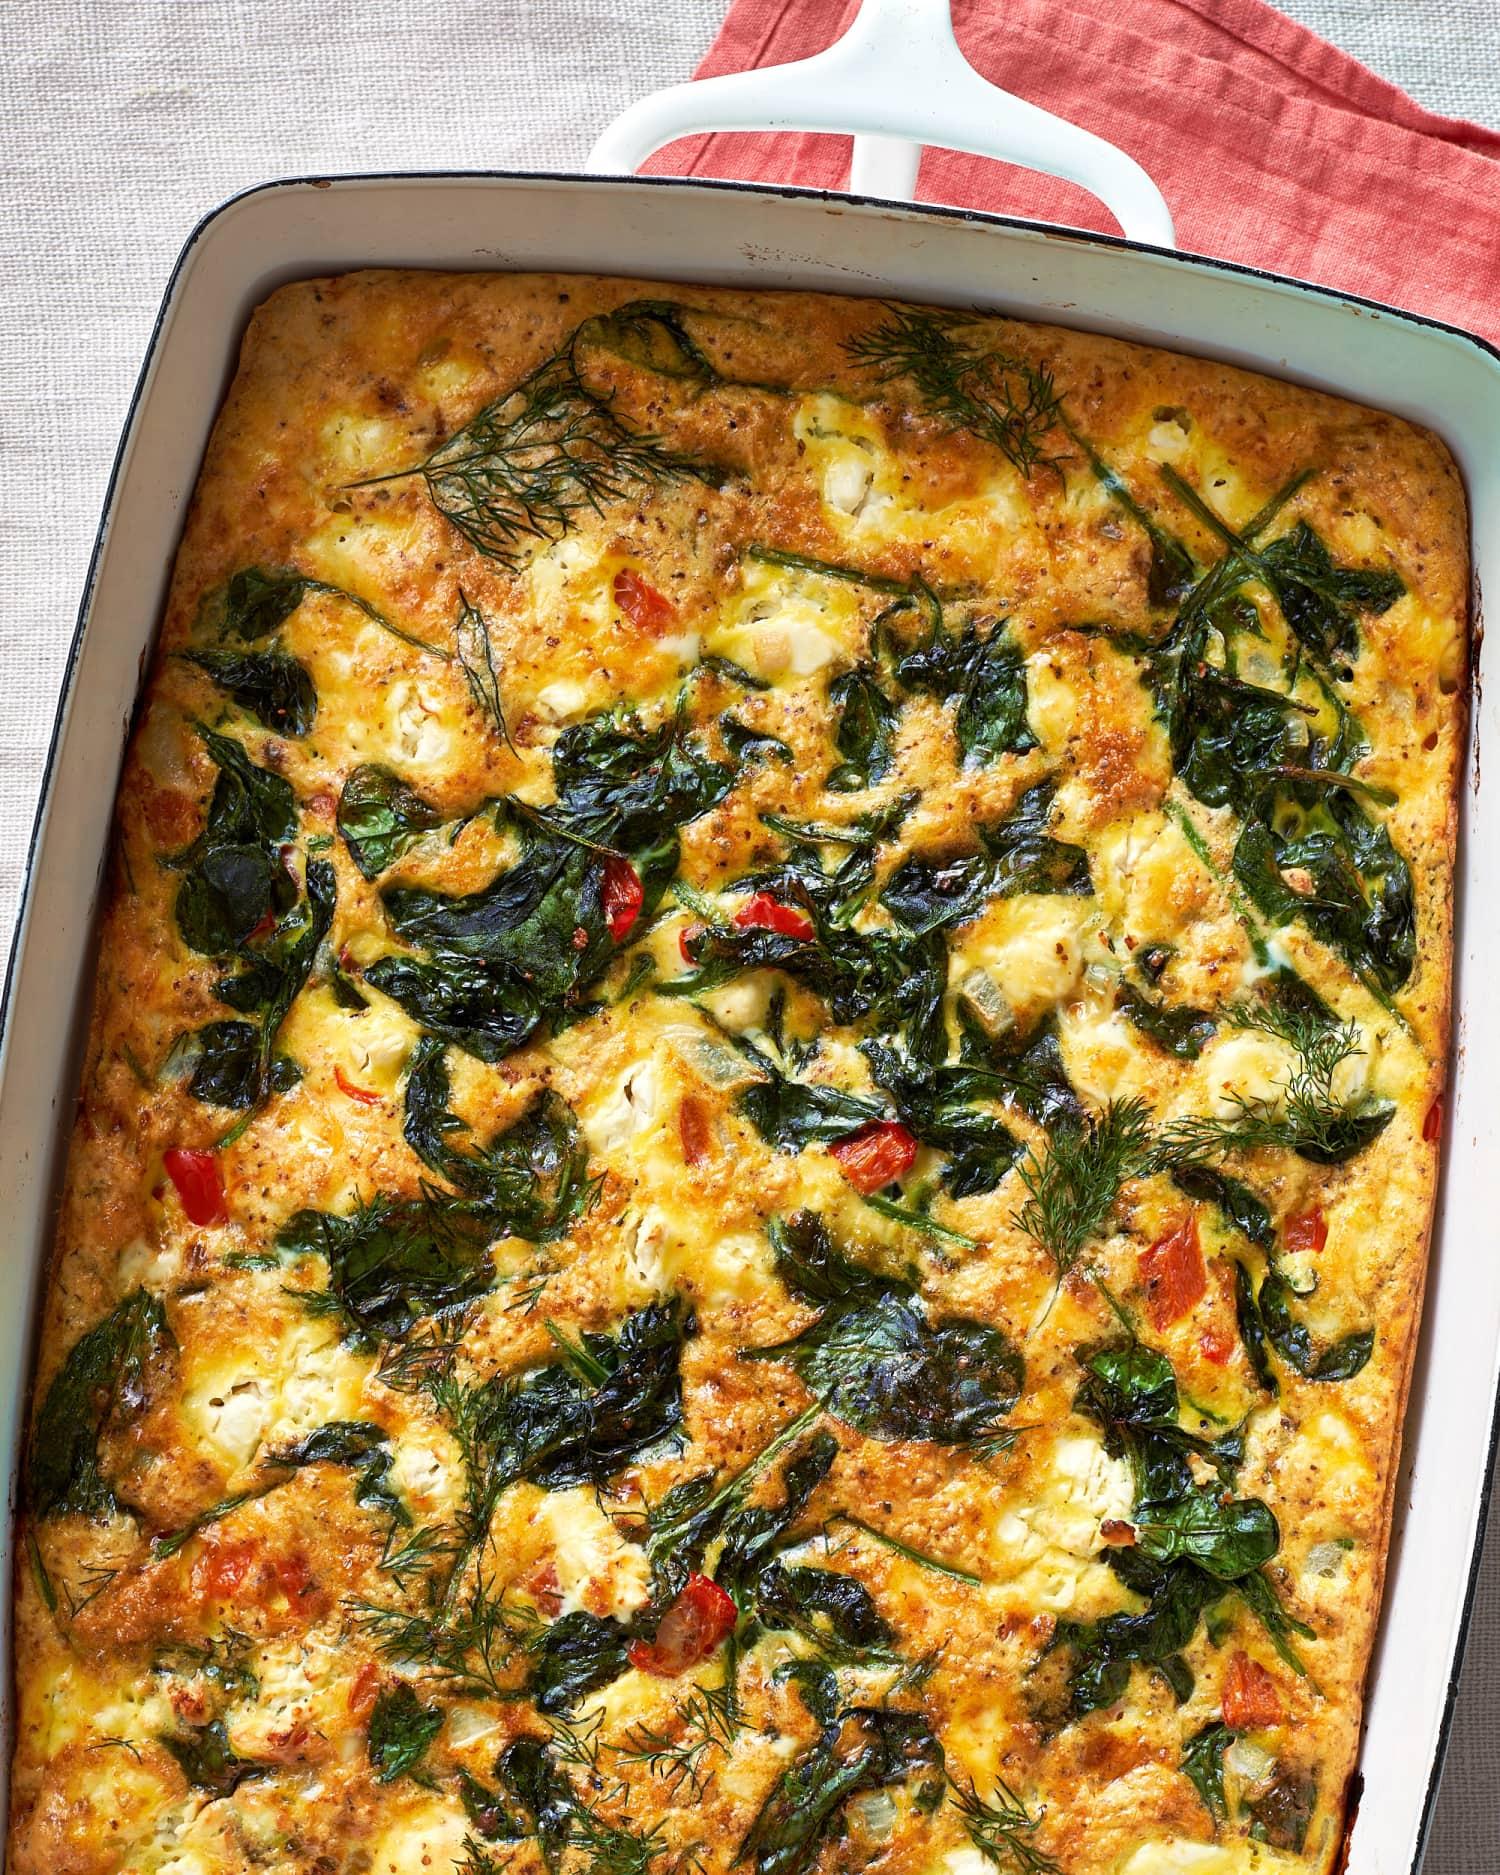 Recipe: Make-Ahead Baked Greek Omelet